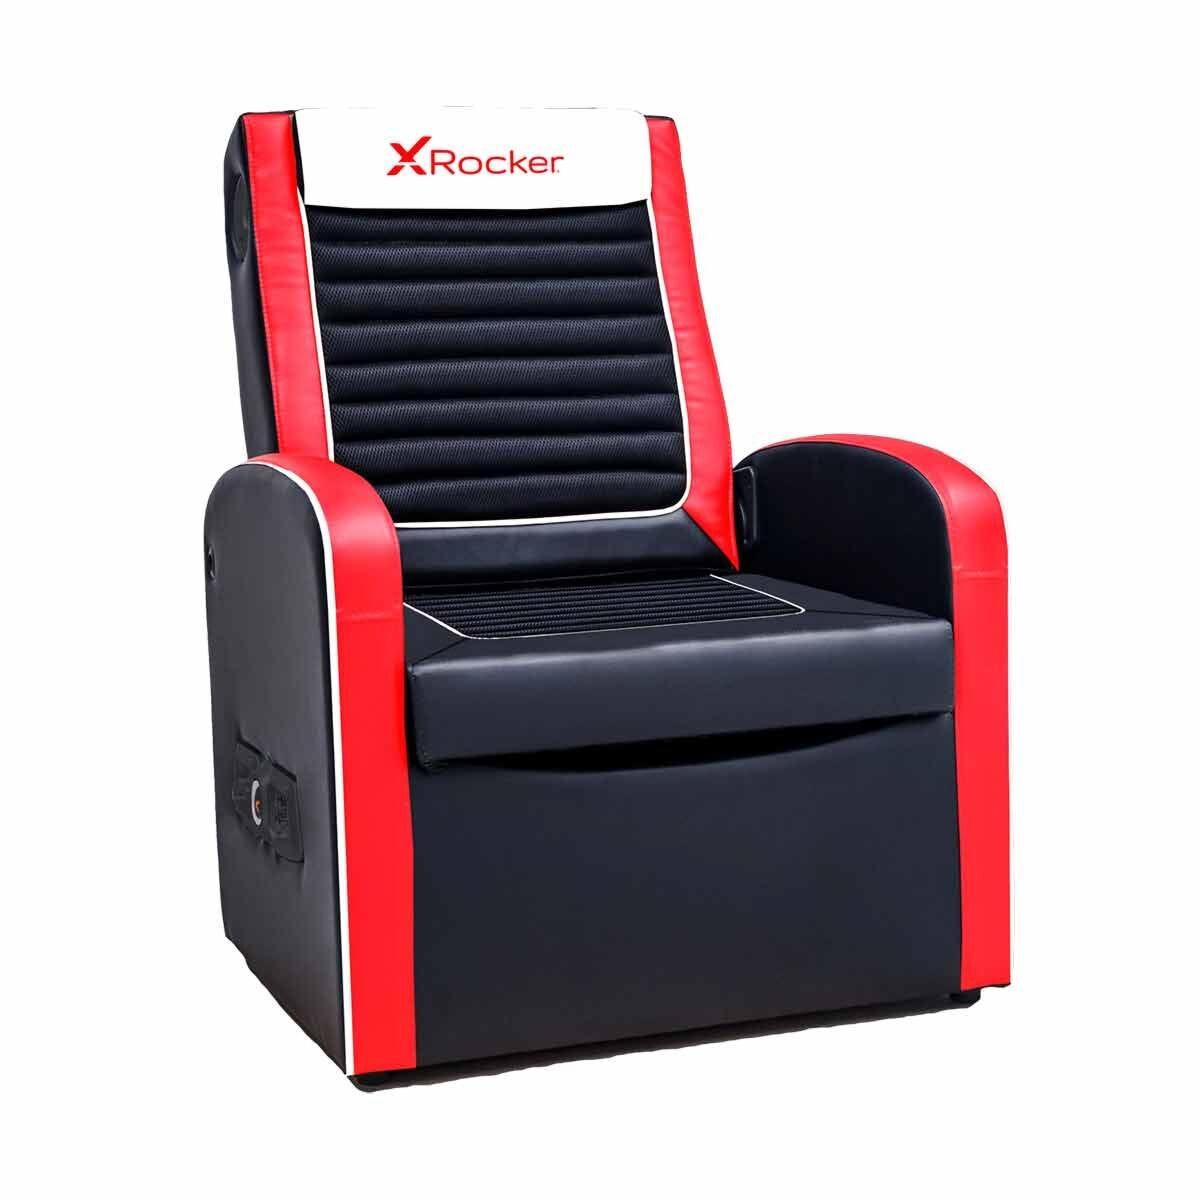 X Rocker Shift Junior Ottoman Gaming Chair